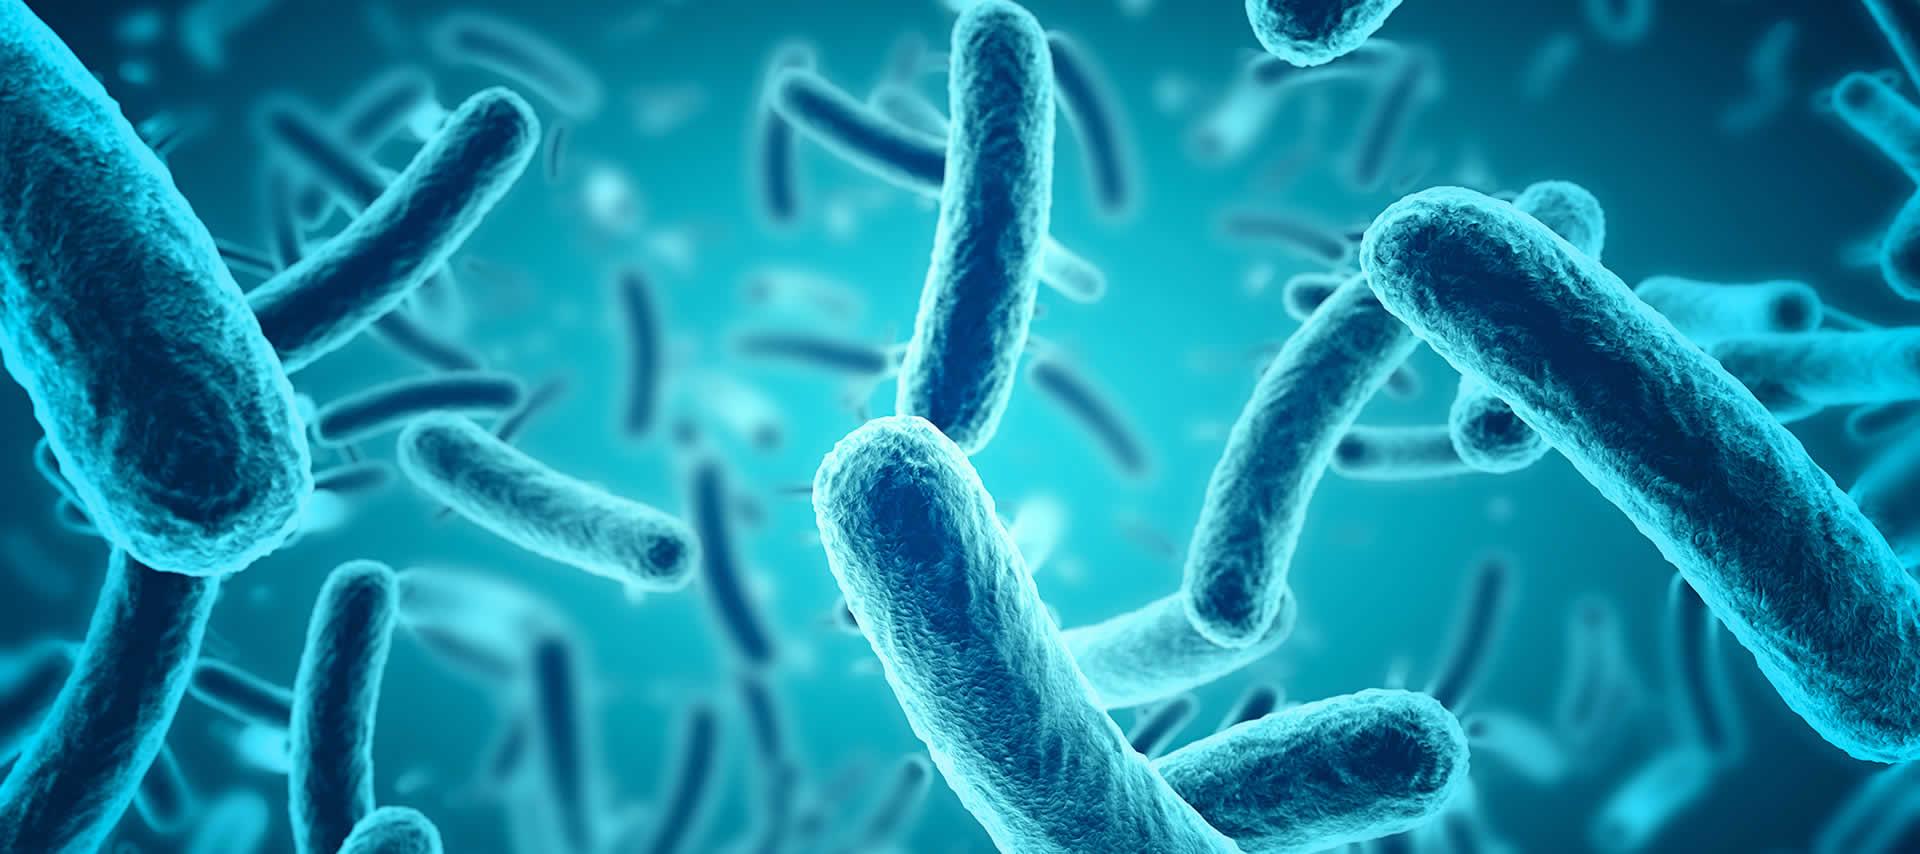 BioSpear Sanitizing Products